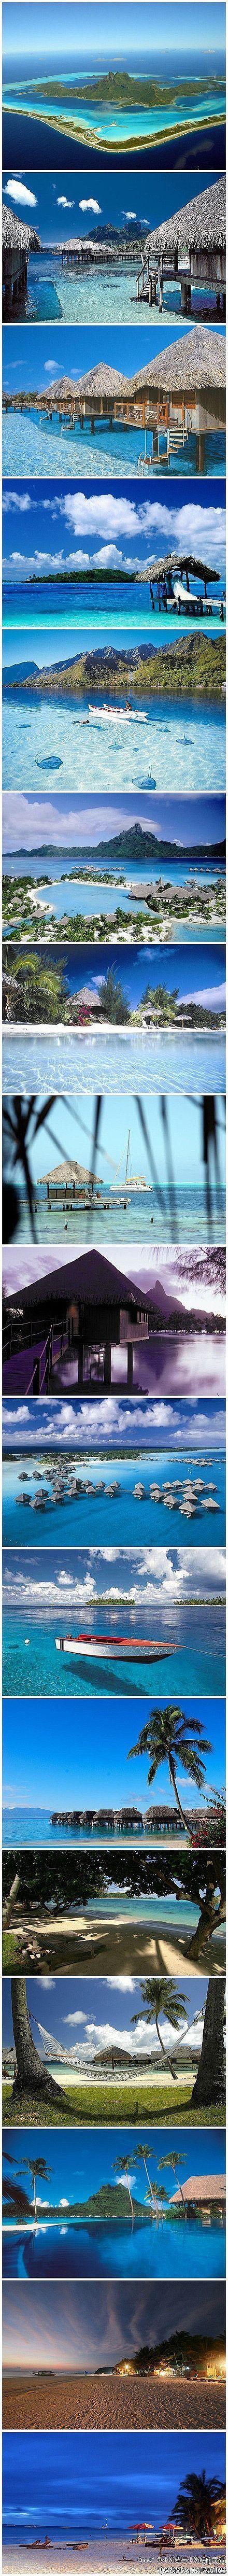 Bora Bora,Tahiti #honeymoon #borabora